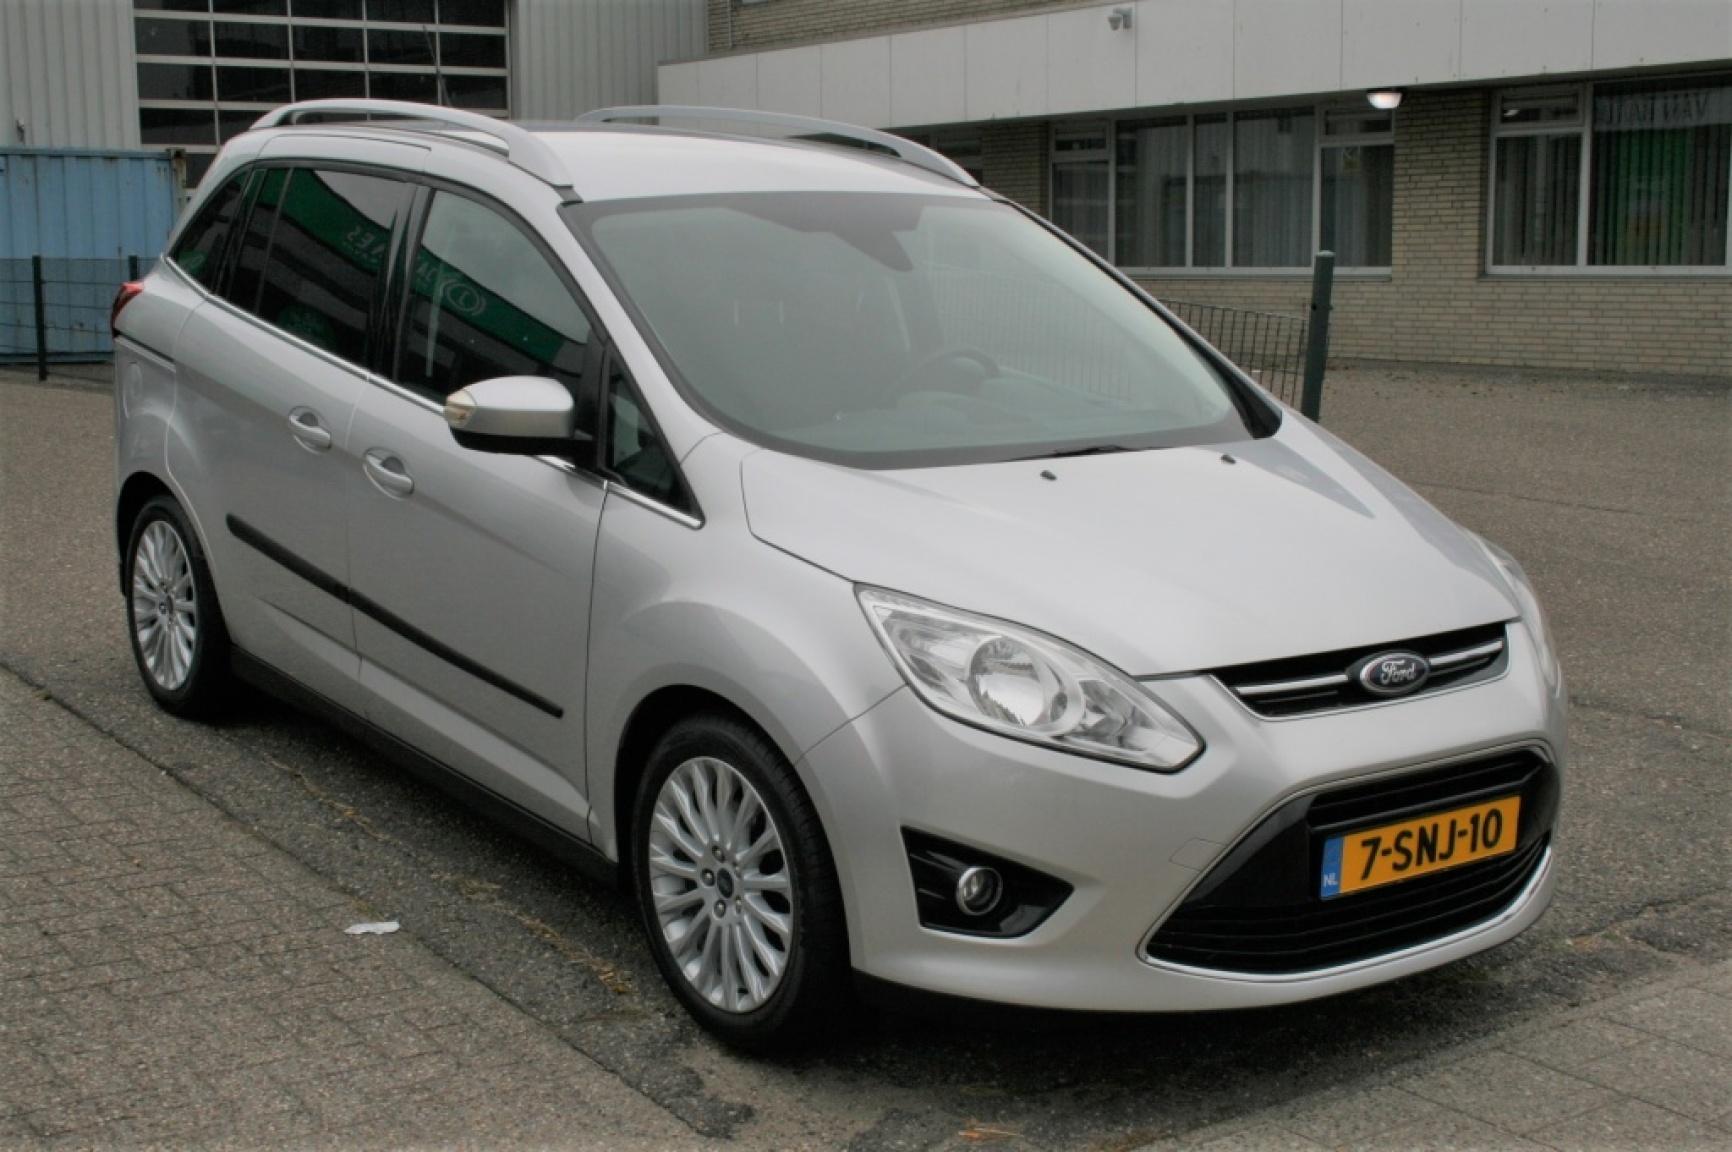 Ford-Grand C-Max-4